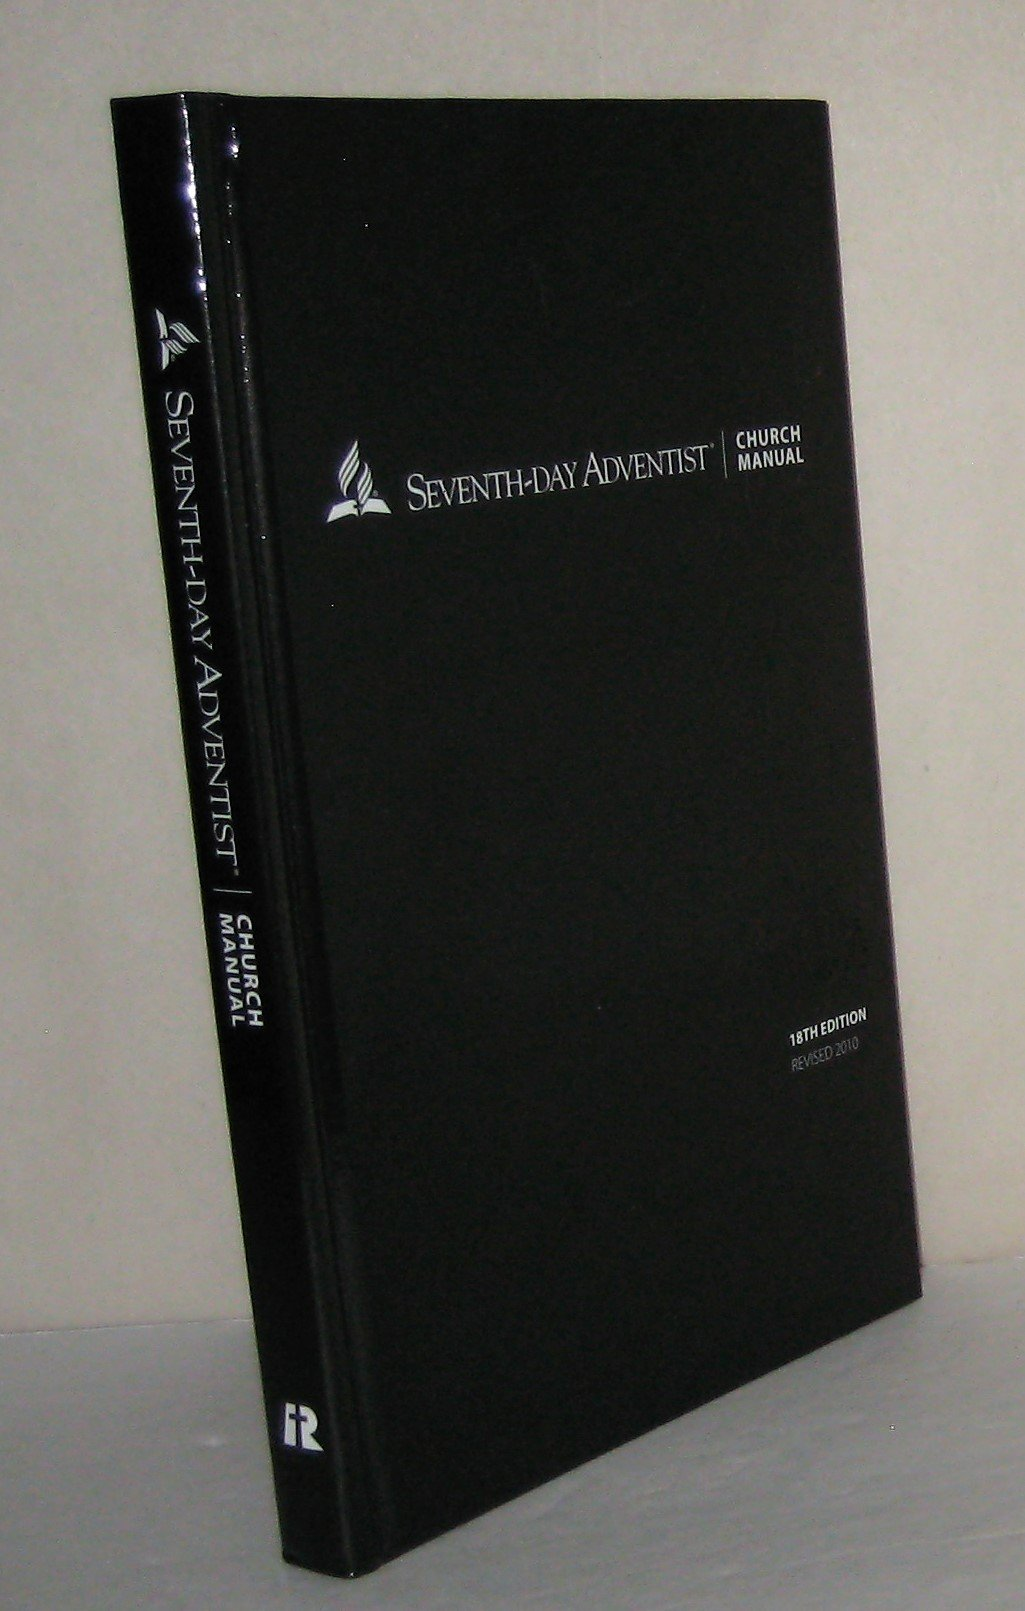 Seventh-day adventist church manual 2015 19th edition.